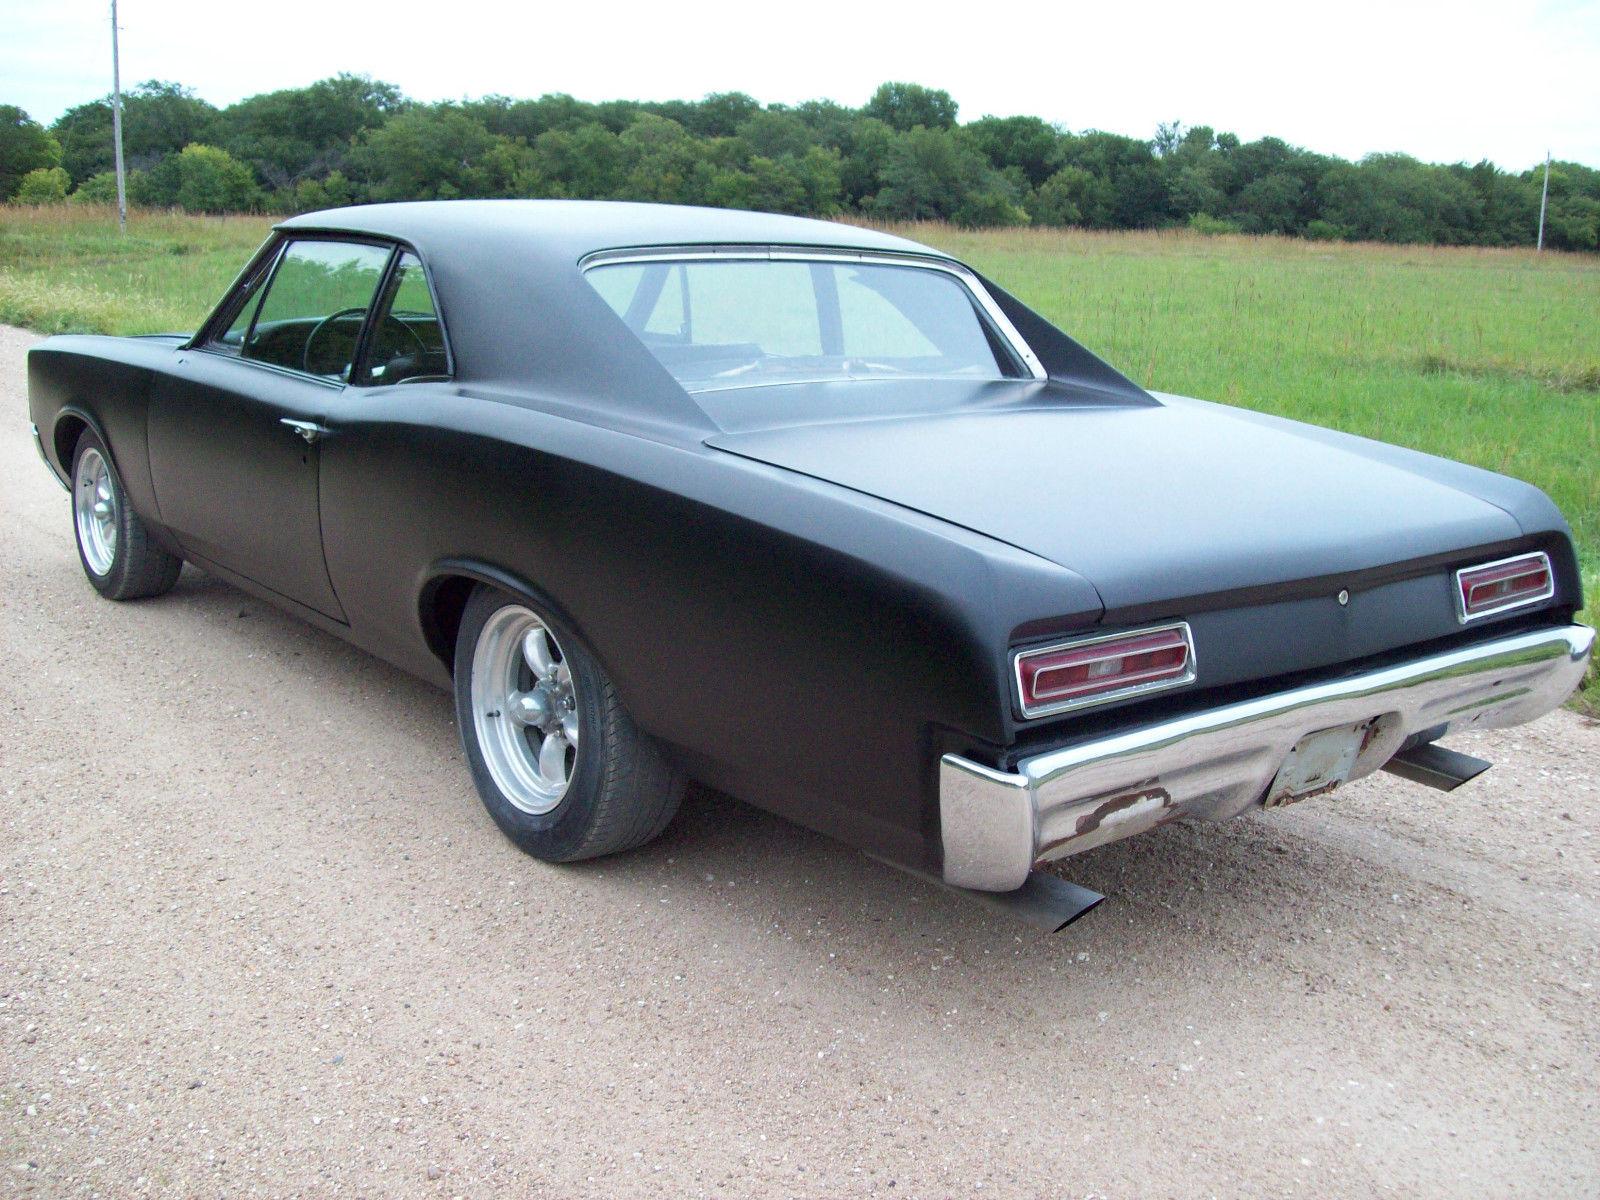 1967 Gto For Sale >> 1967 Pontiac Tempest Coupe - Classic Pontiac Tempest 1967 for sale